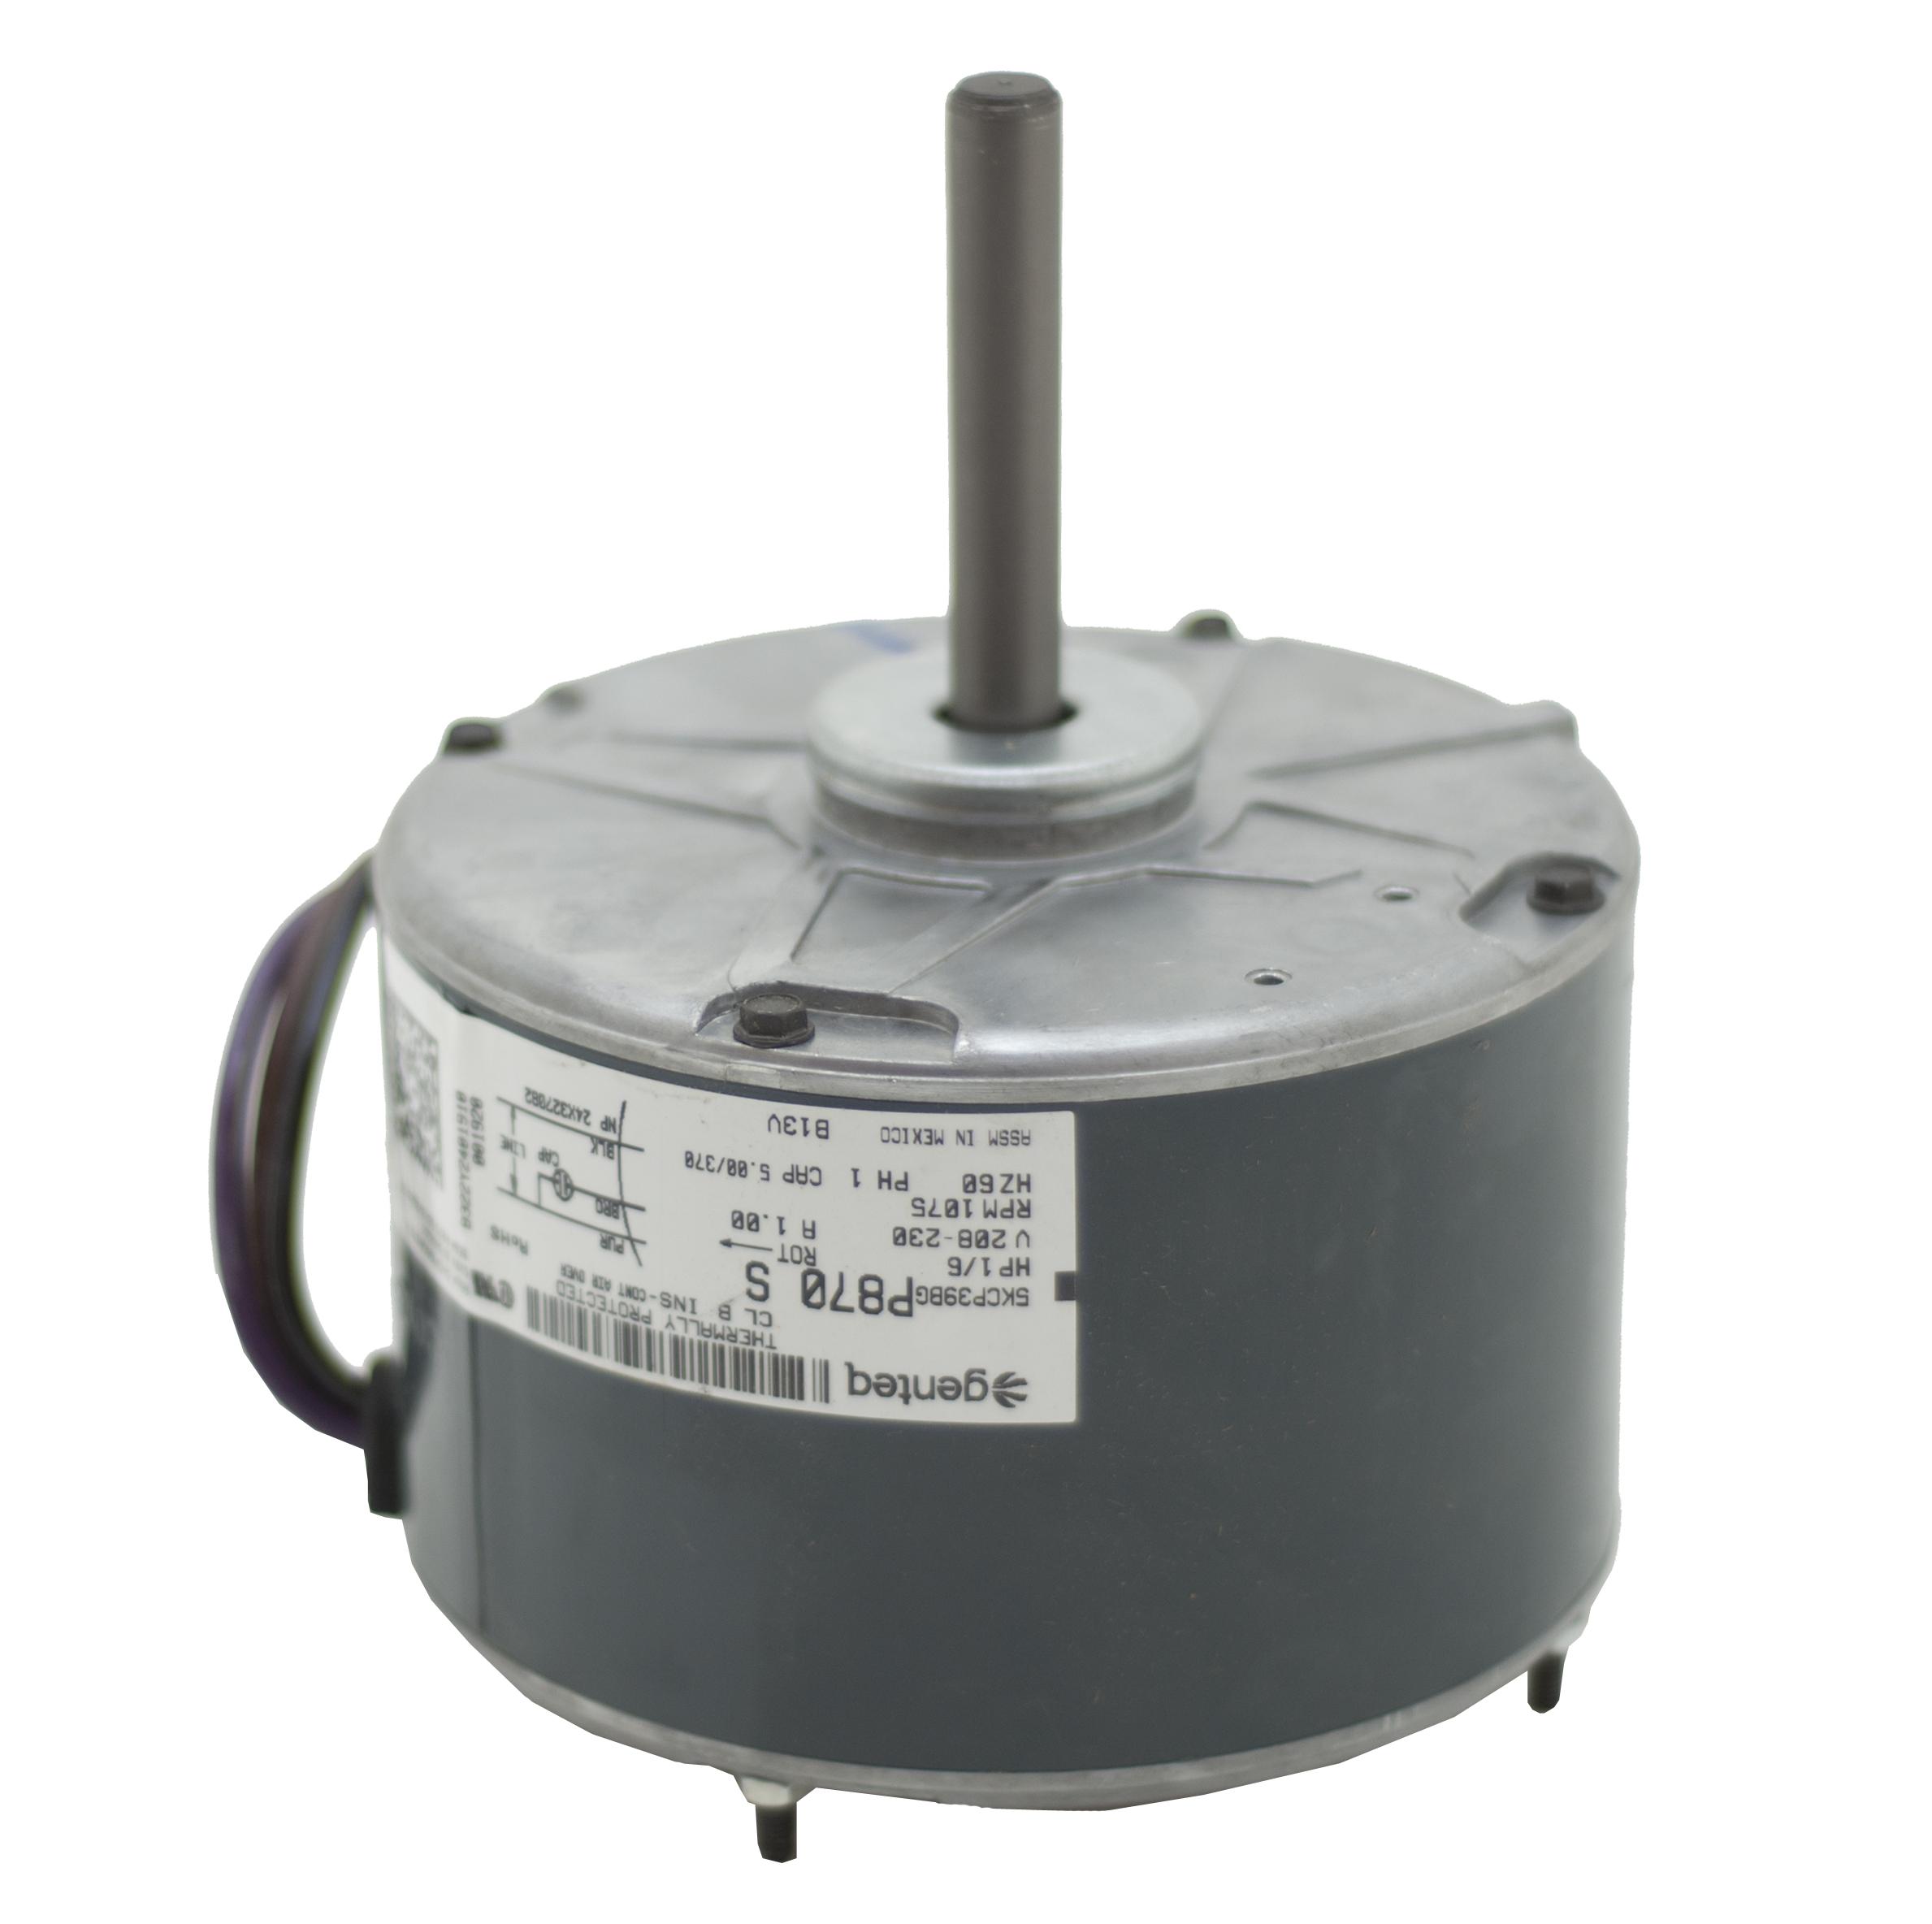 Condenser Fan Motor Wiring Diagram For Pinterest